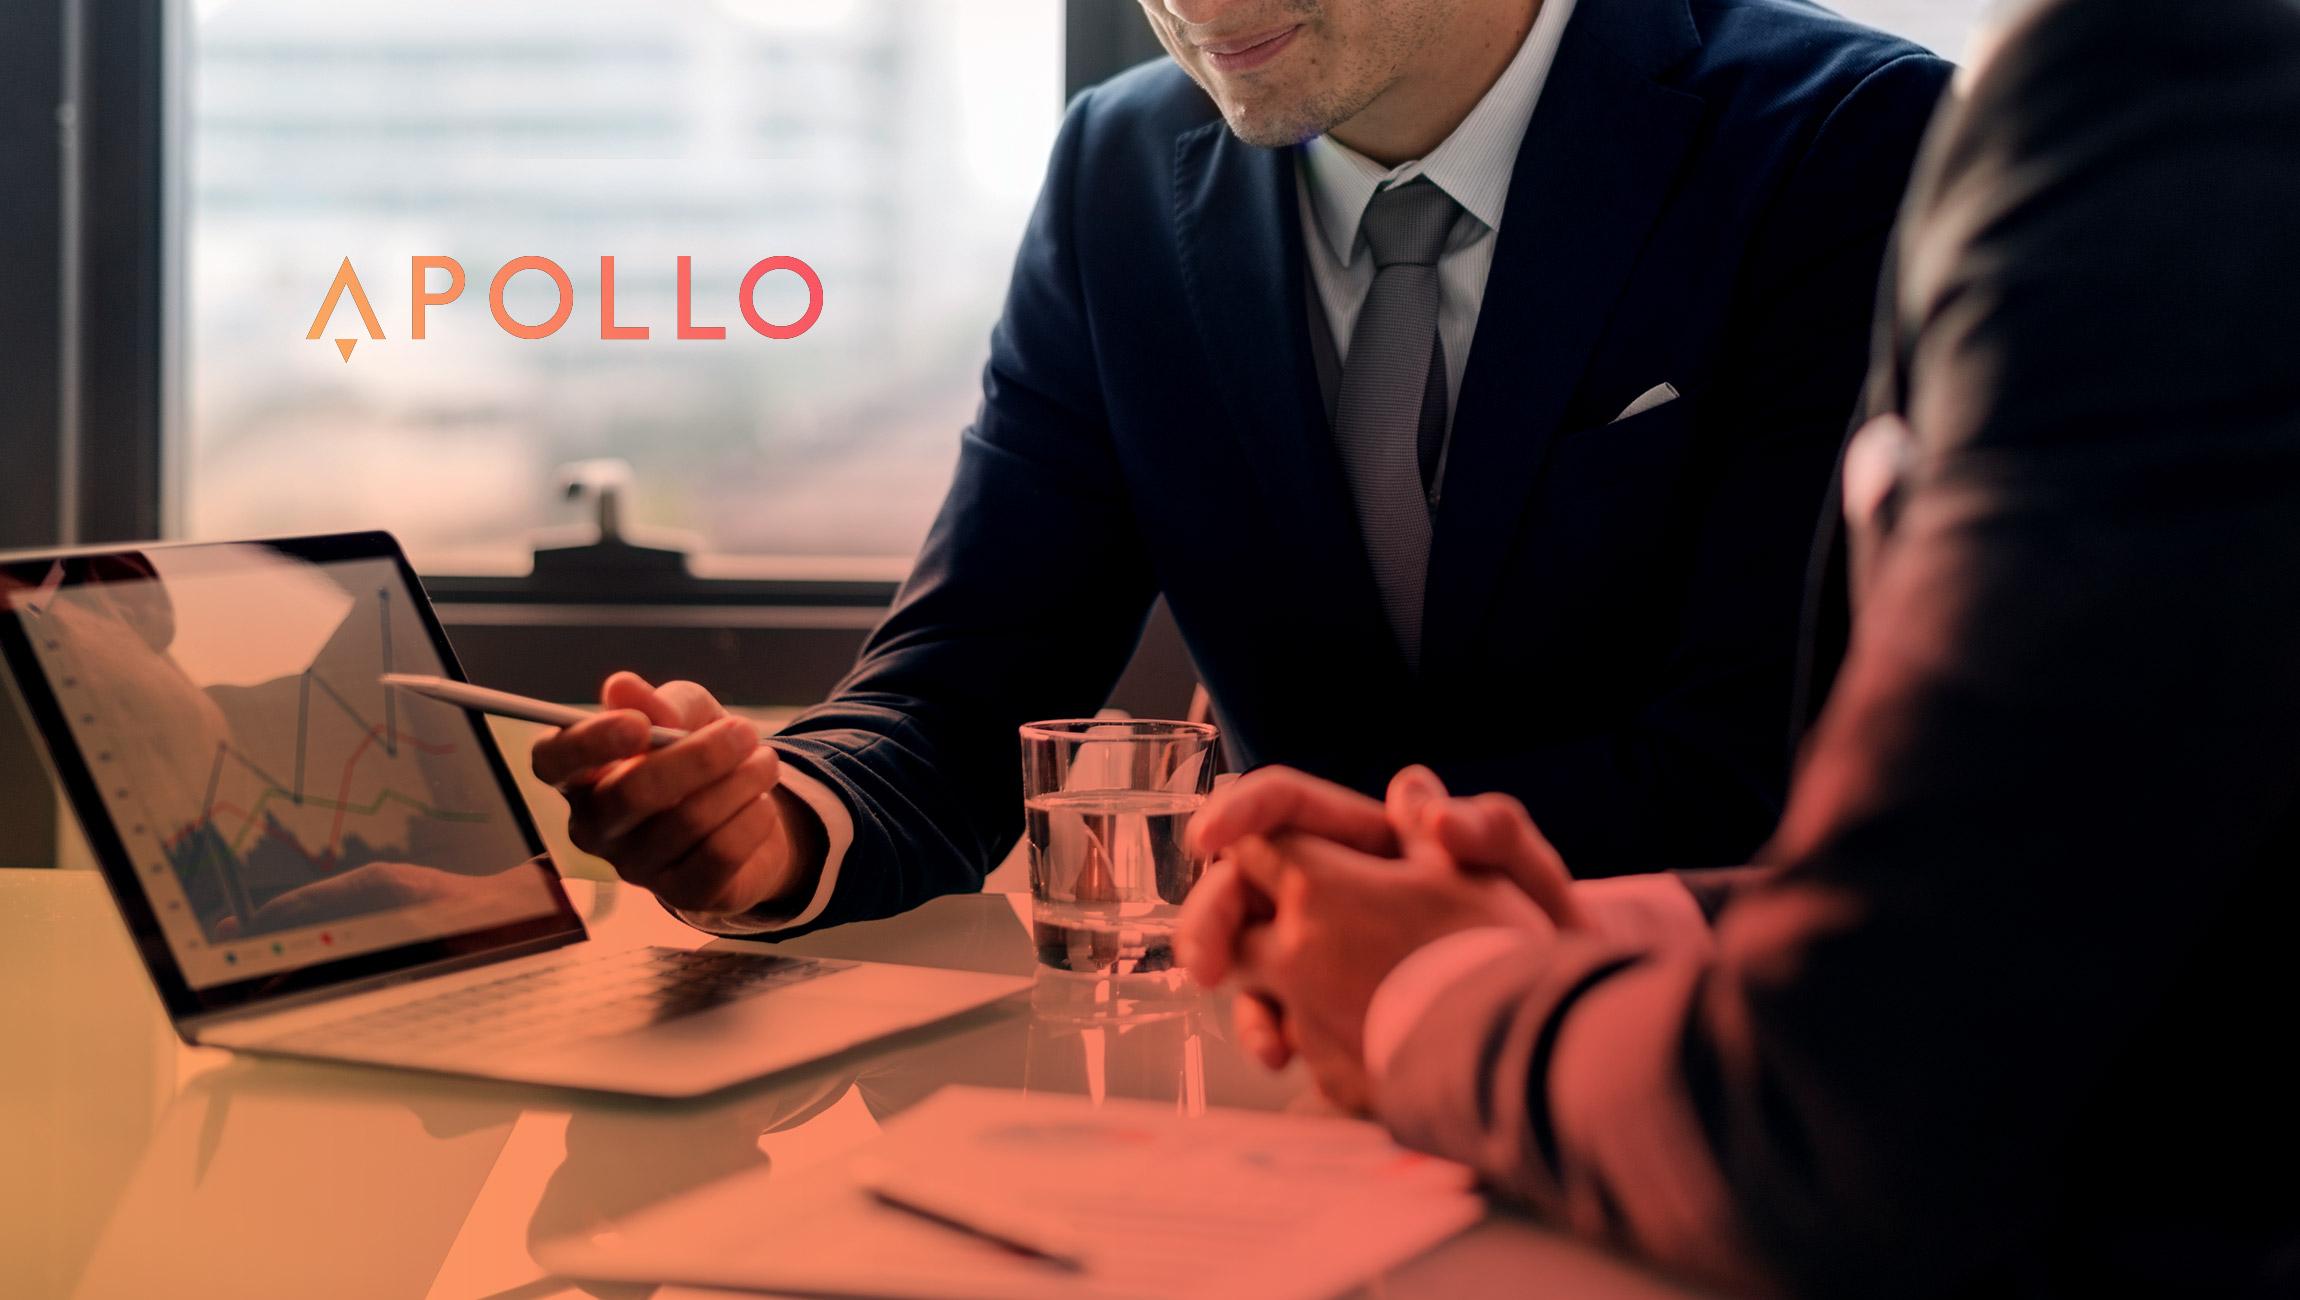 Apollo.io Brings on ClearSlide Co-Founder Jim Benton as CEO